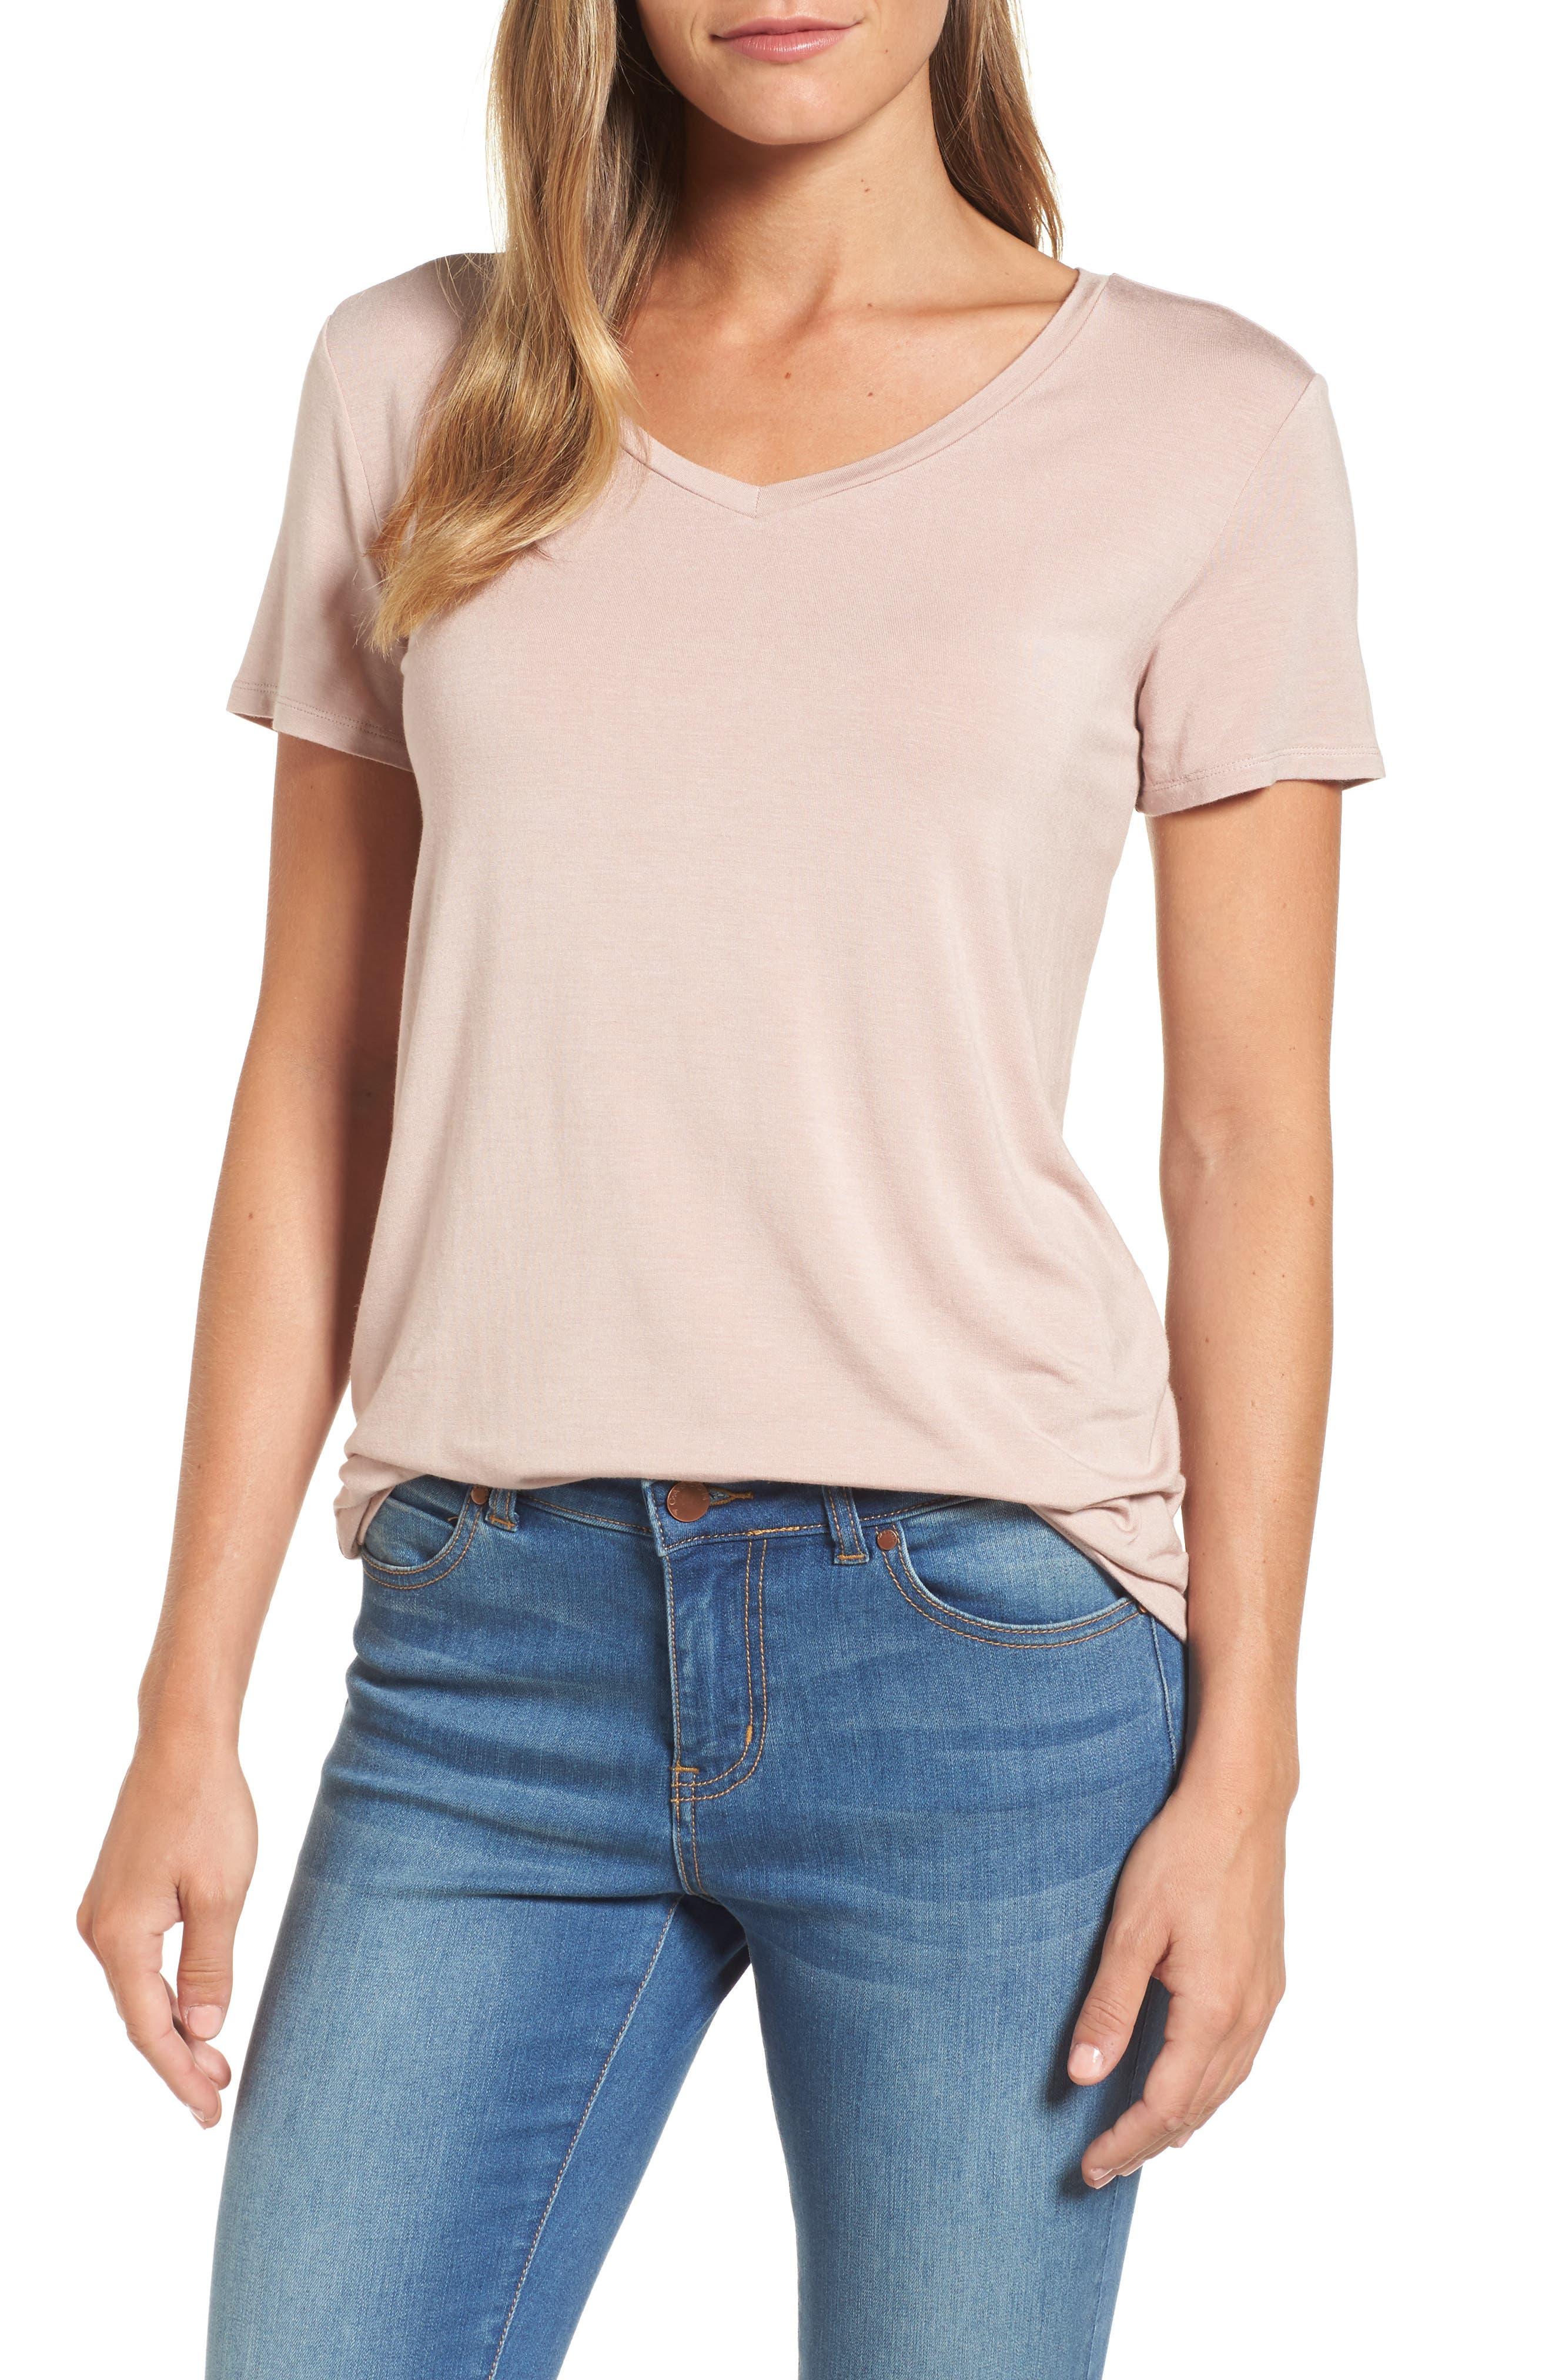 Alternate Image 1 Selected - Halogen® Modal Jersey V-Neck Tee (Regular & Petite)